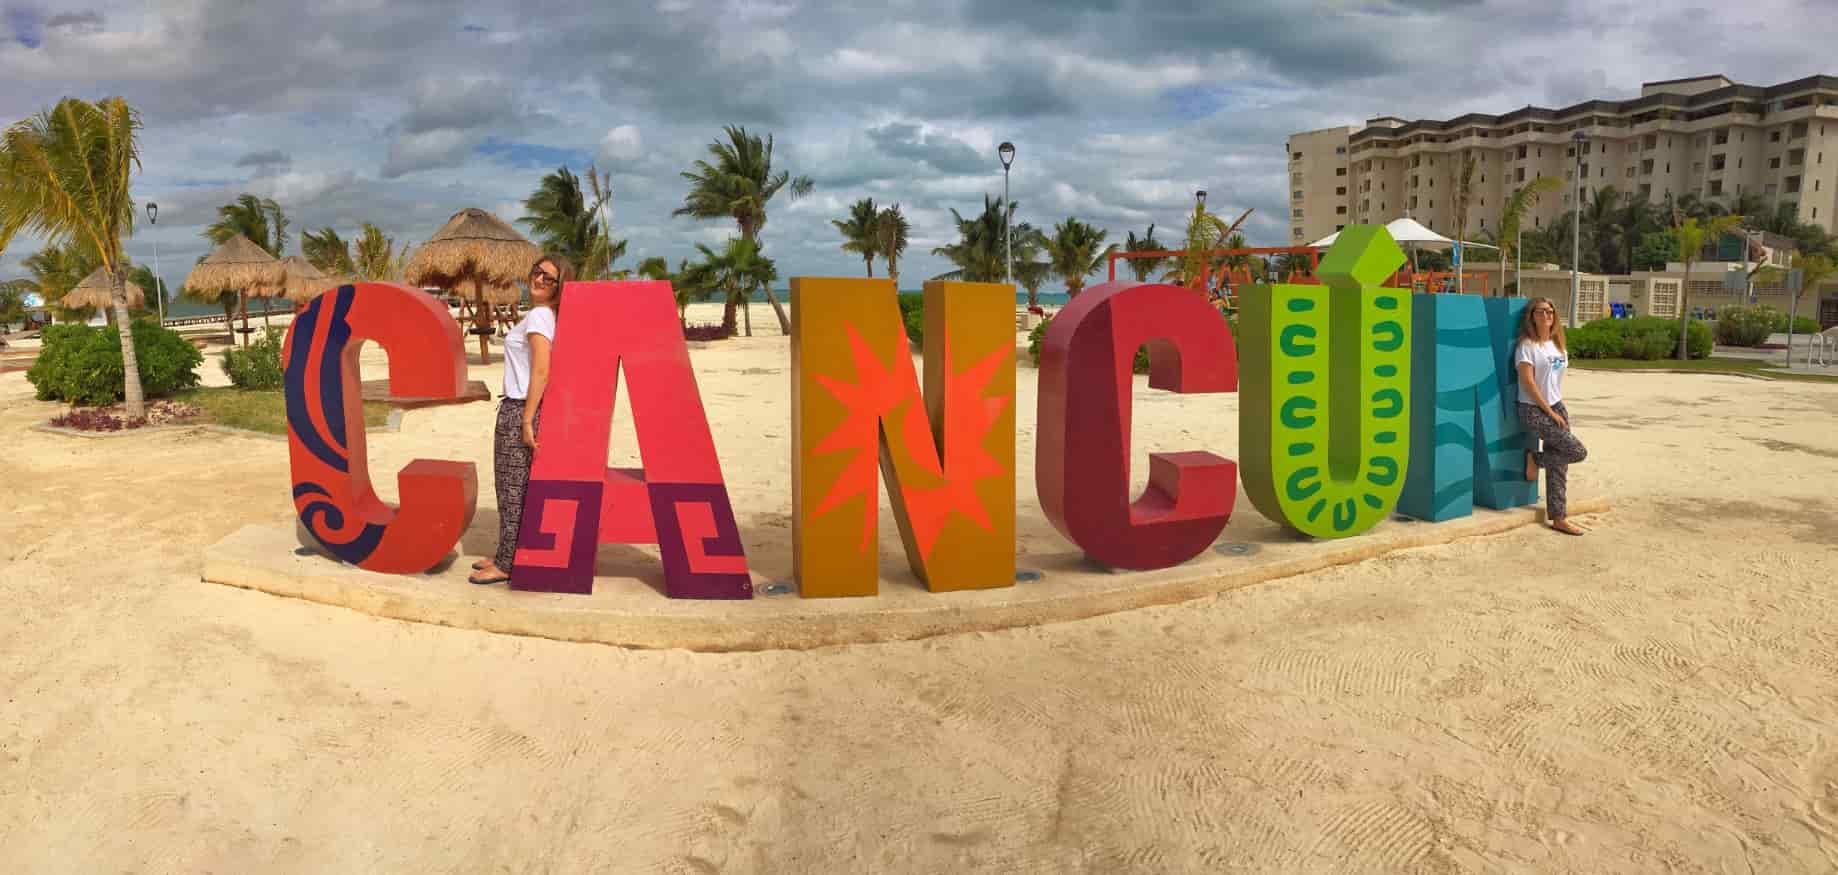 que ver en Cancún - Letrero de Cancún